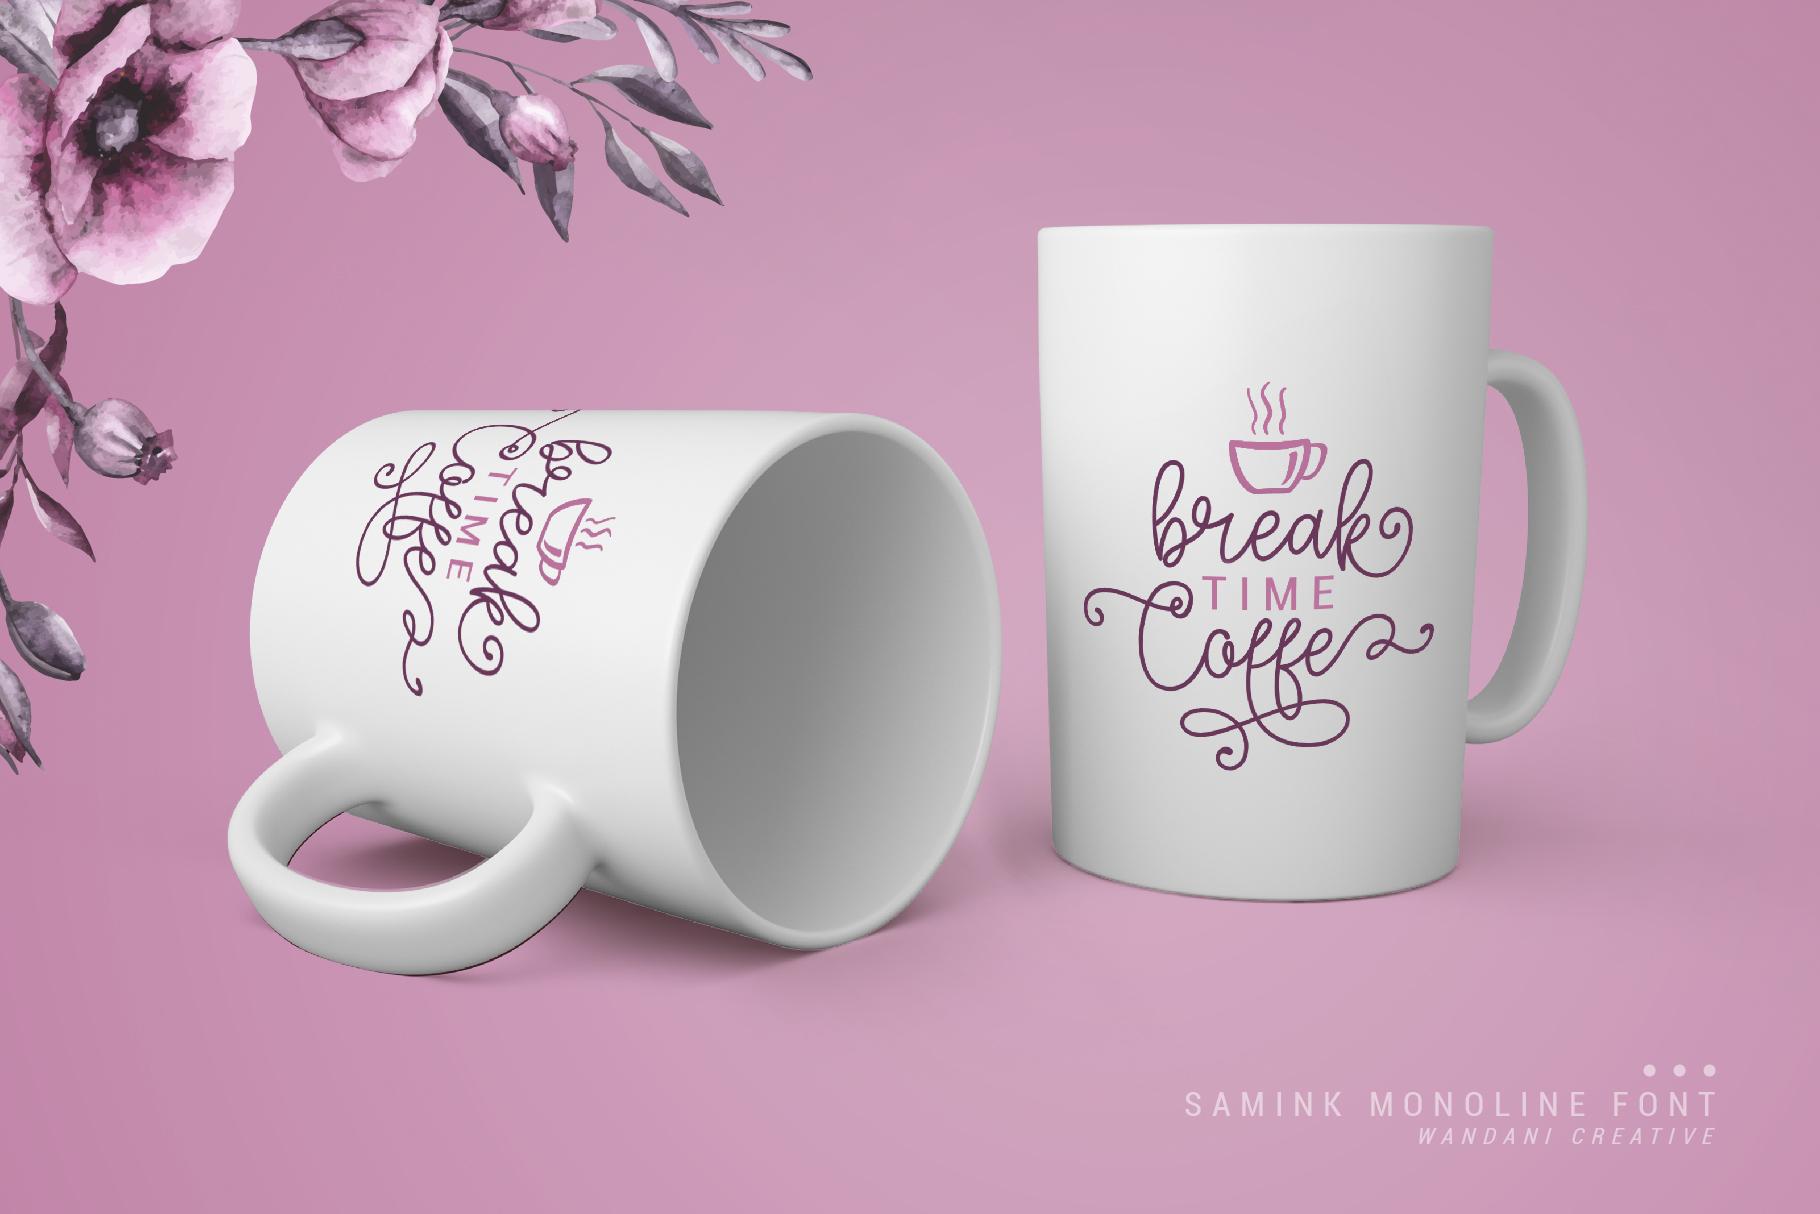 Samink Monoline font & Extras example image 4